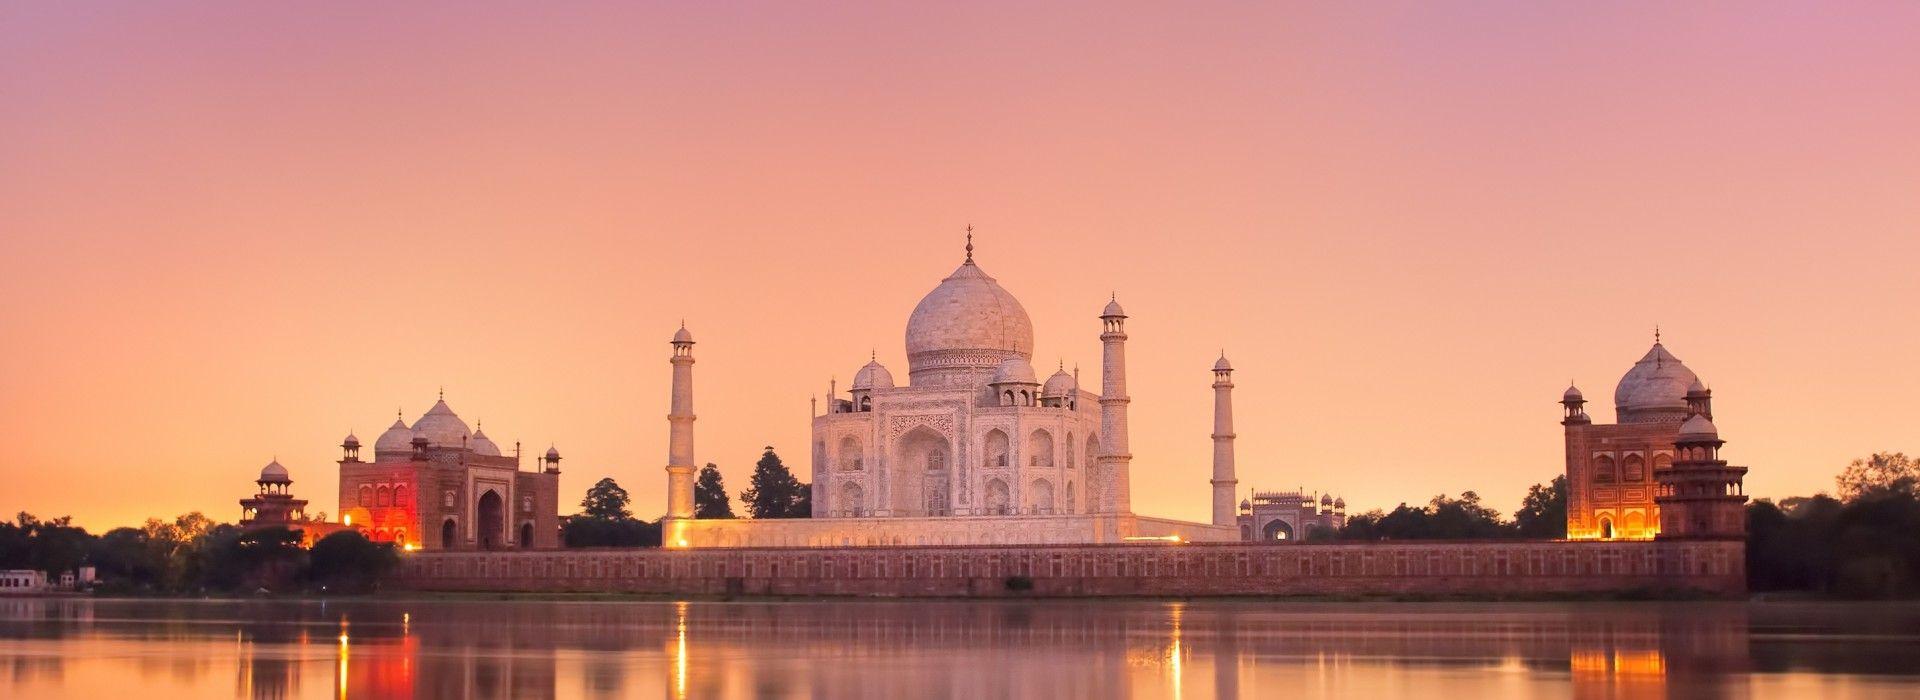 Beach, romance, getaways and relaxation Tours in Mumbai